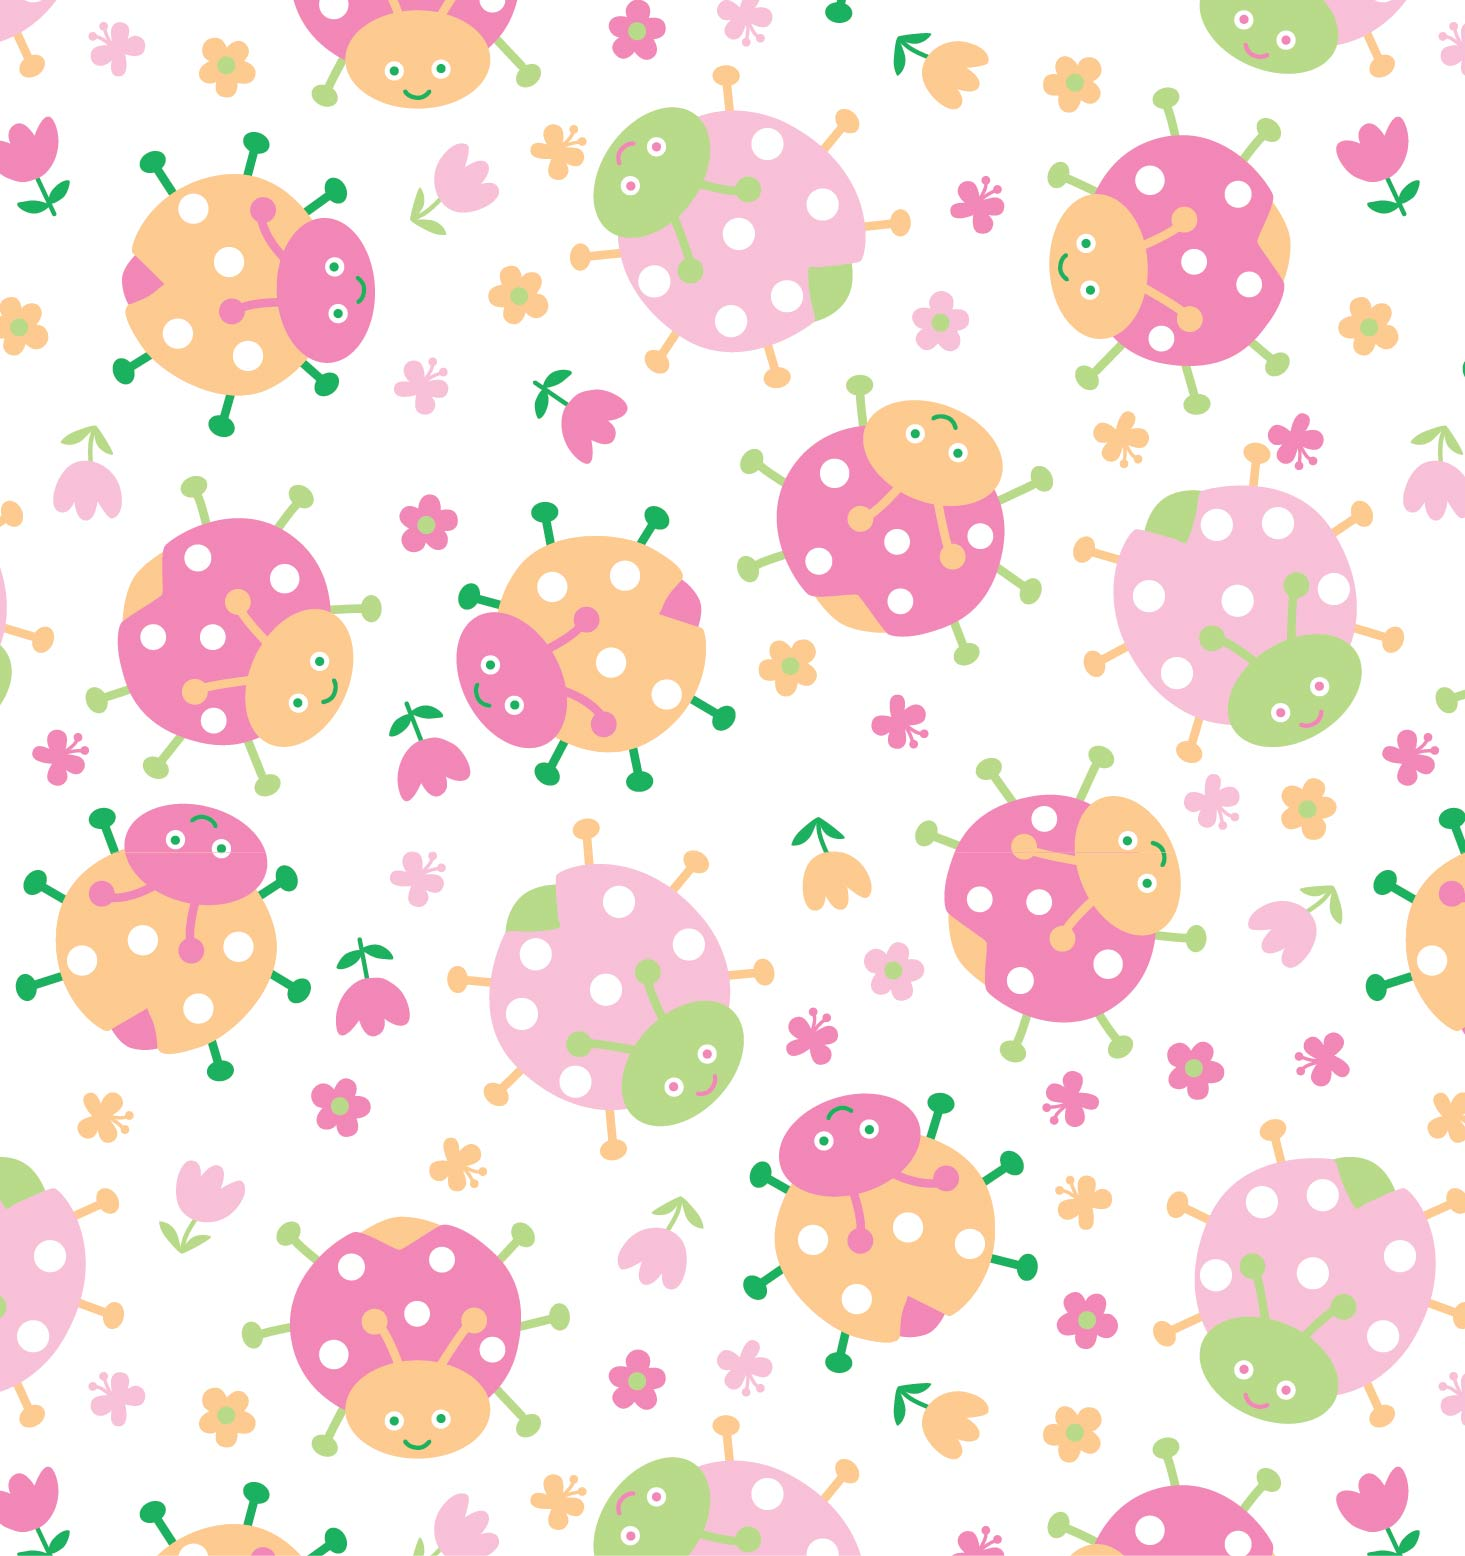 Colorful ladybugs print